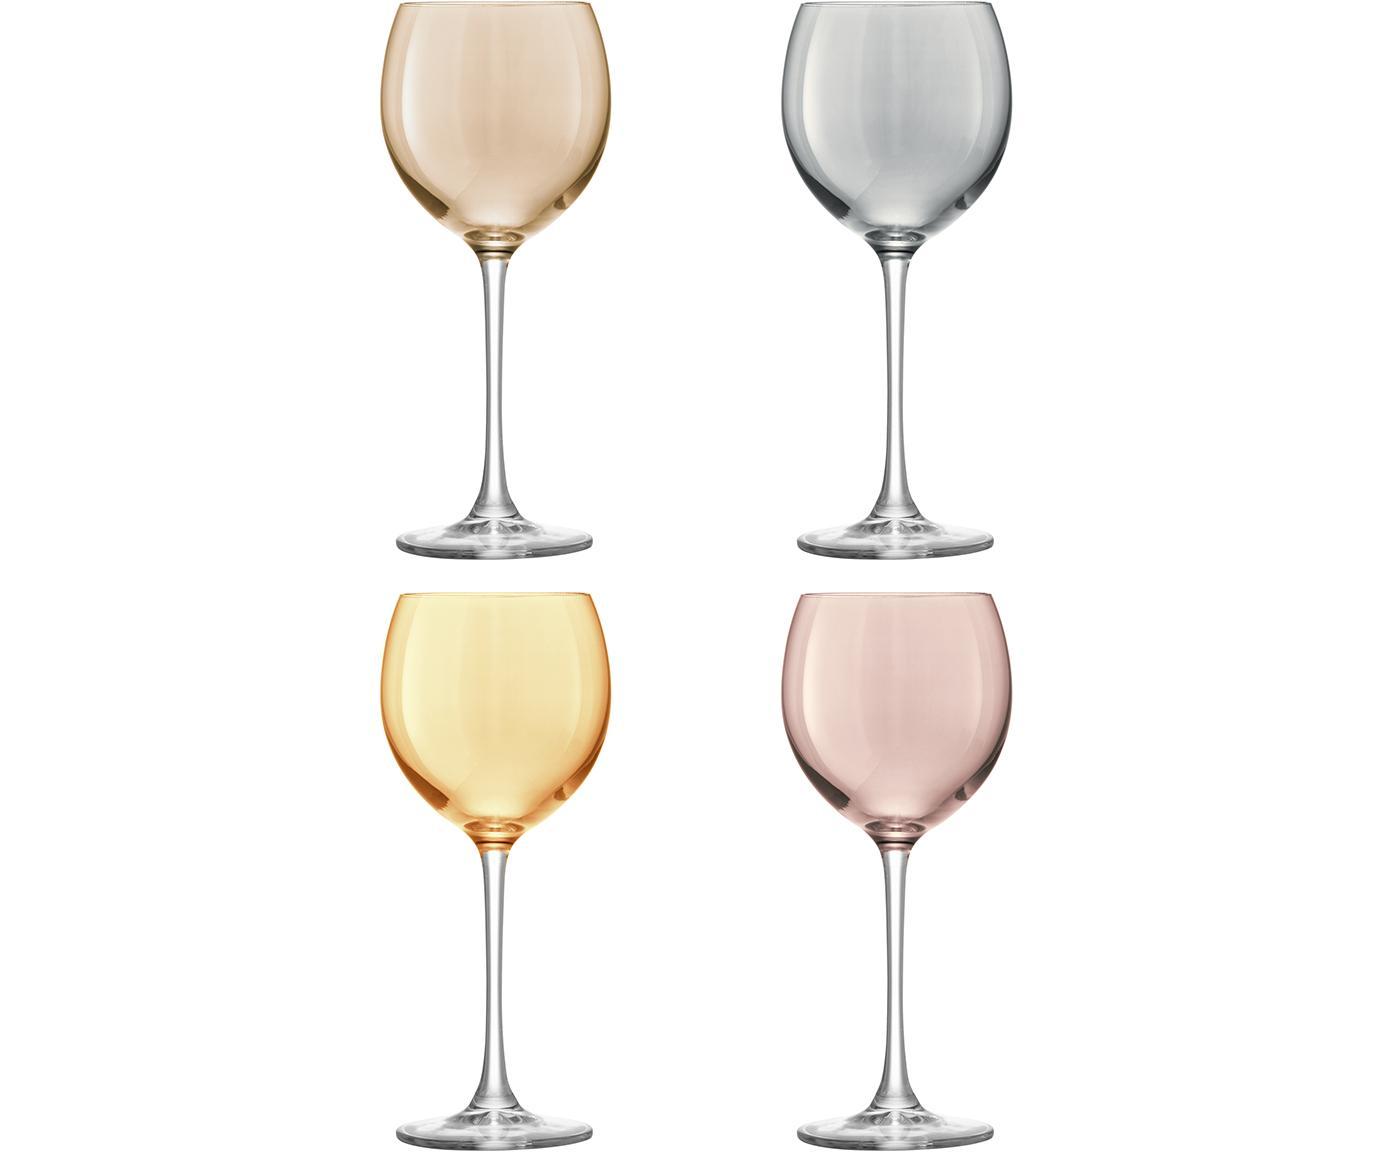 Handbemalte Weingläser Polka, 4er-Set, Glas, Gelb, Kastanienbraun, Grau, Braun, Ø 9 x H 21 cm